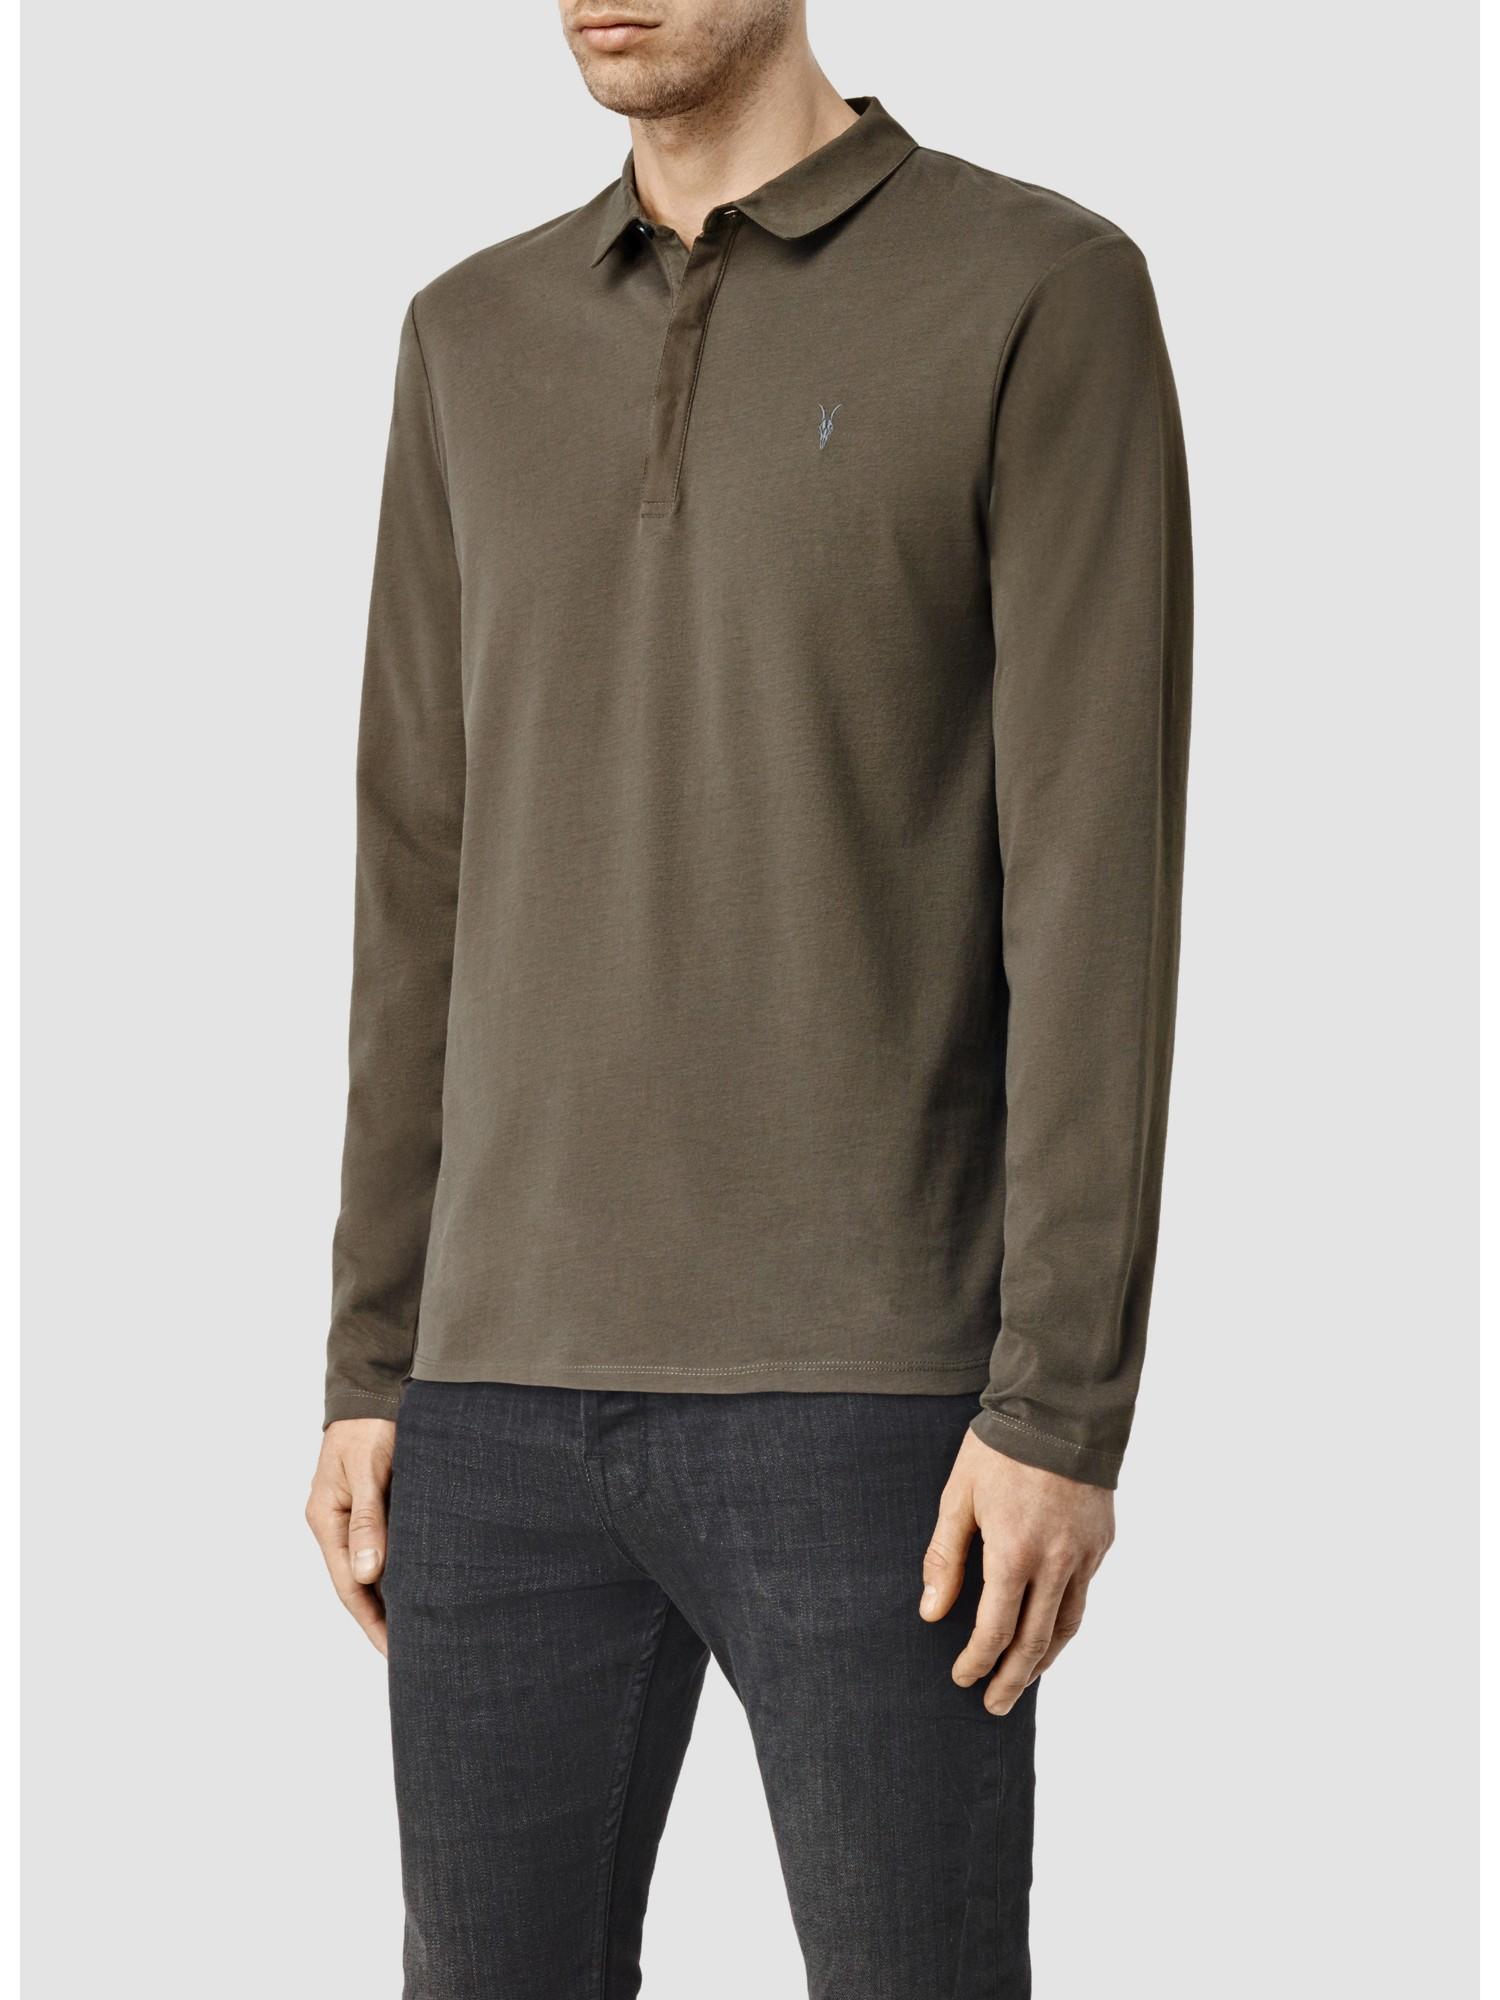 Lyst Allsaints Brace Long Sleeve Polo Shirt In Brown For Men